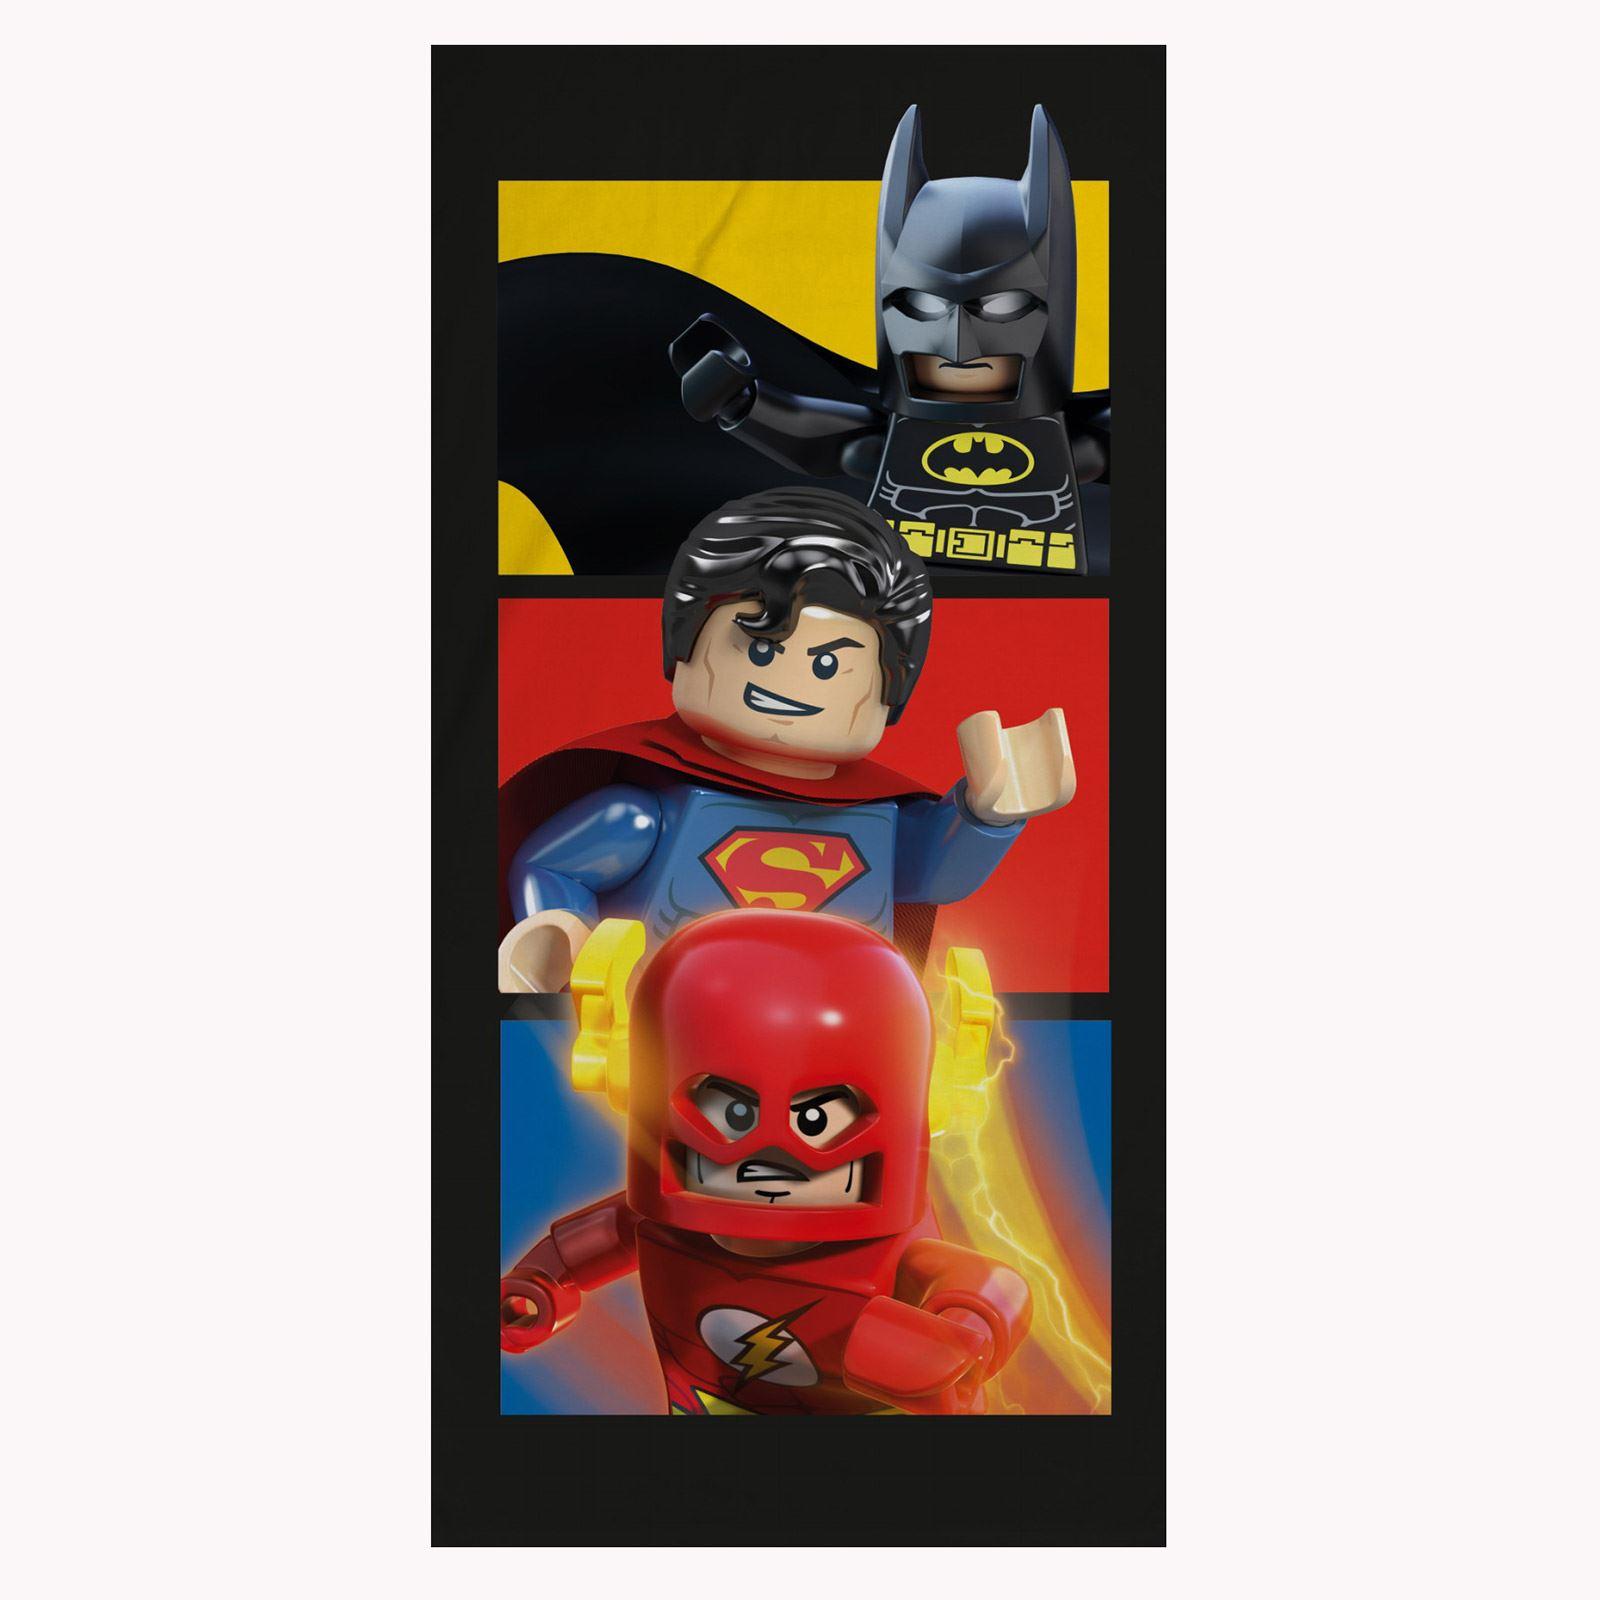 Beach Bedroom Furniture Bedroom Remodel Batman Bedroom Wallpaper Scandinavian Bedroom Curtains: LEGO DC COMICS LARGE TOWEL BATMAN SUPERMAN FLASH